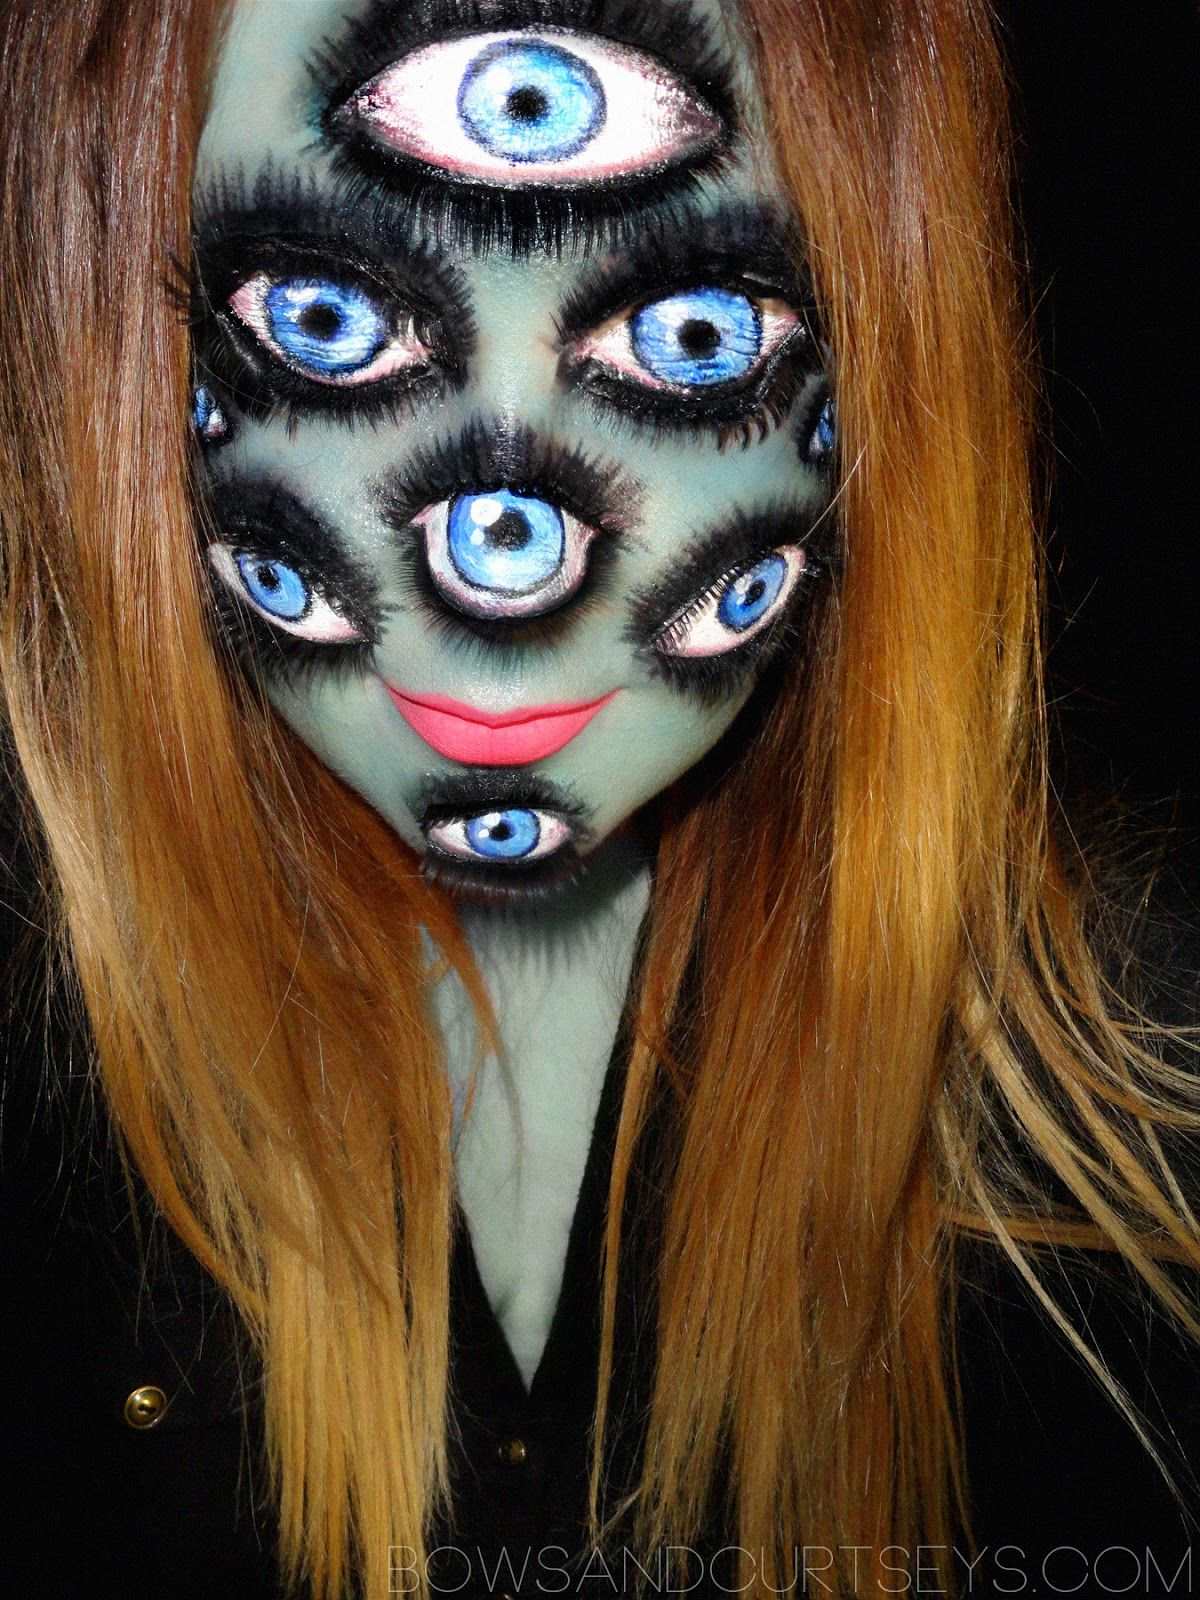 Multiple eye makeup work is great! Cool halloween